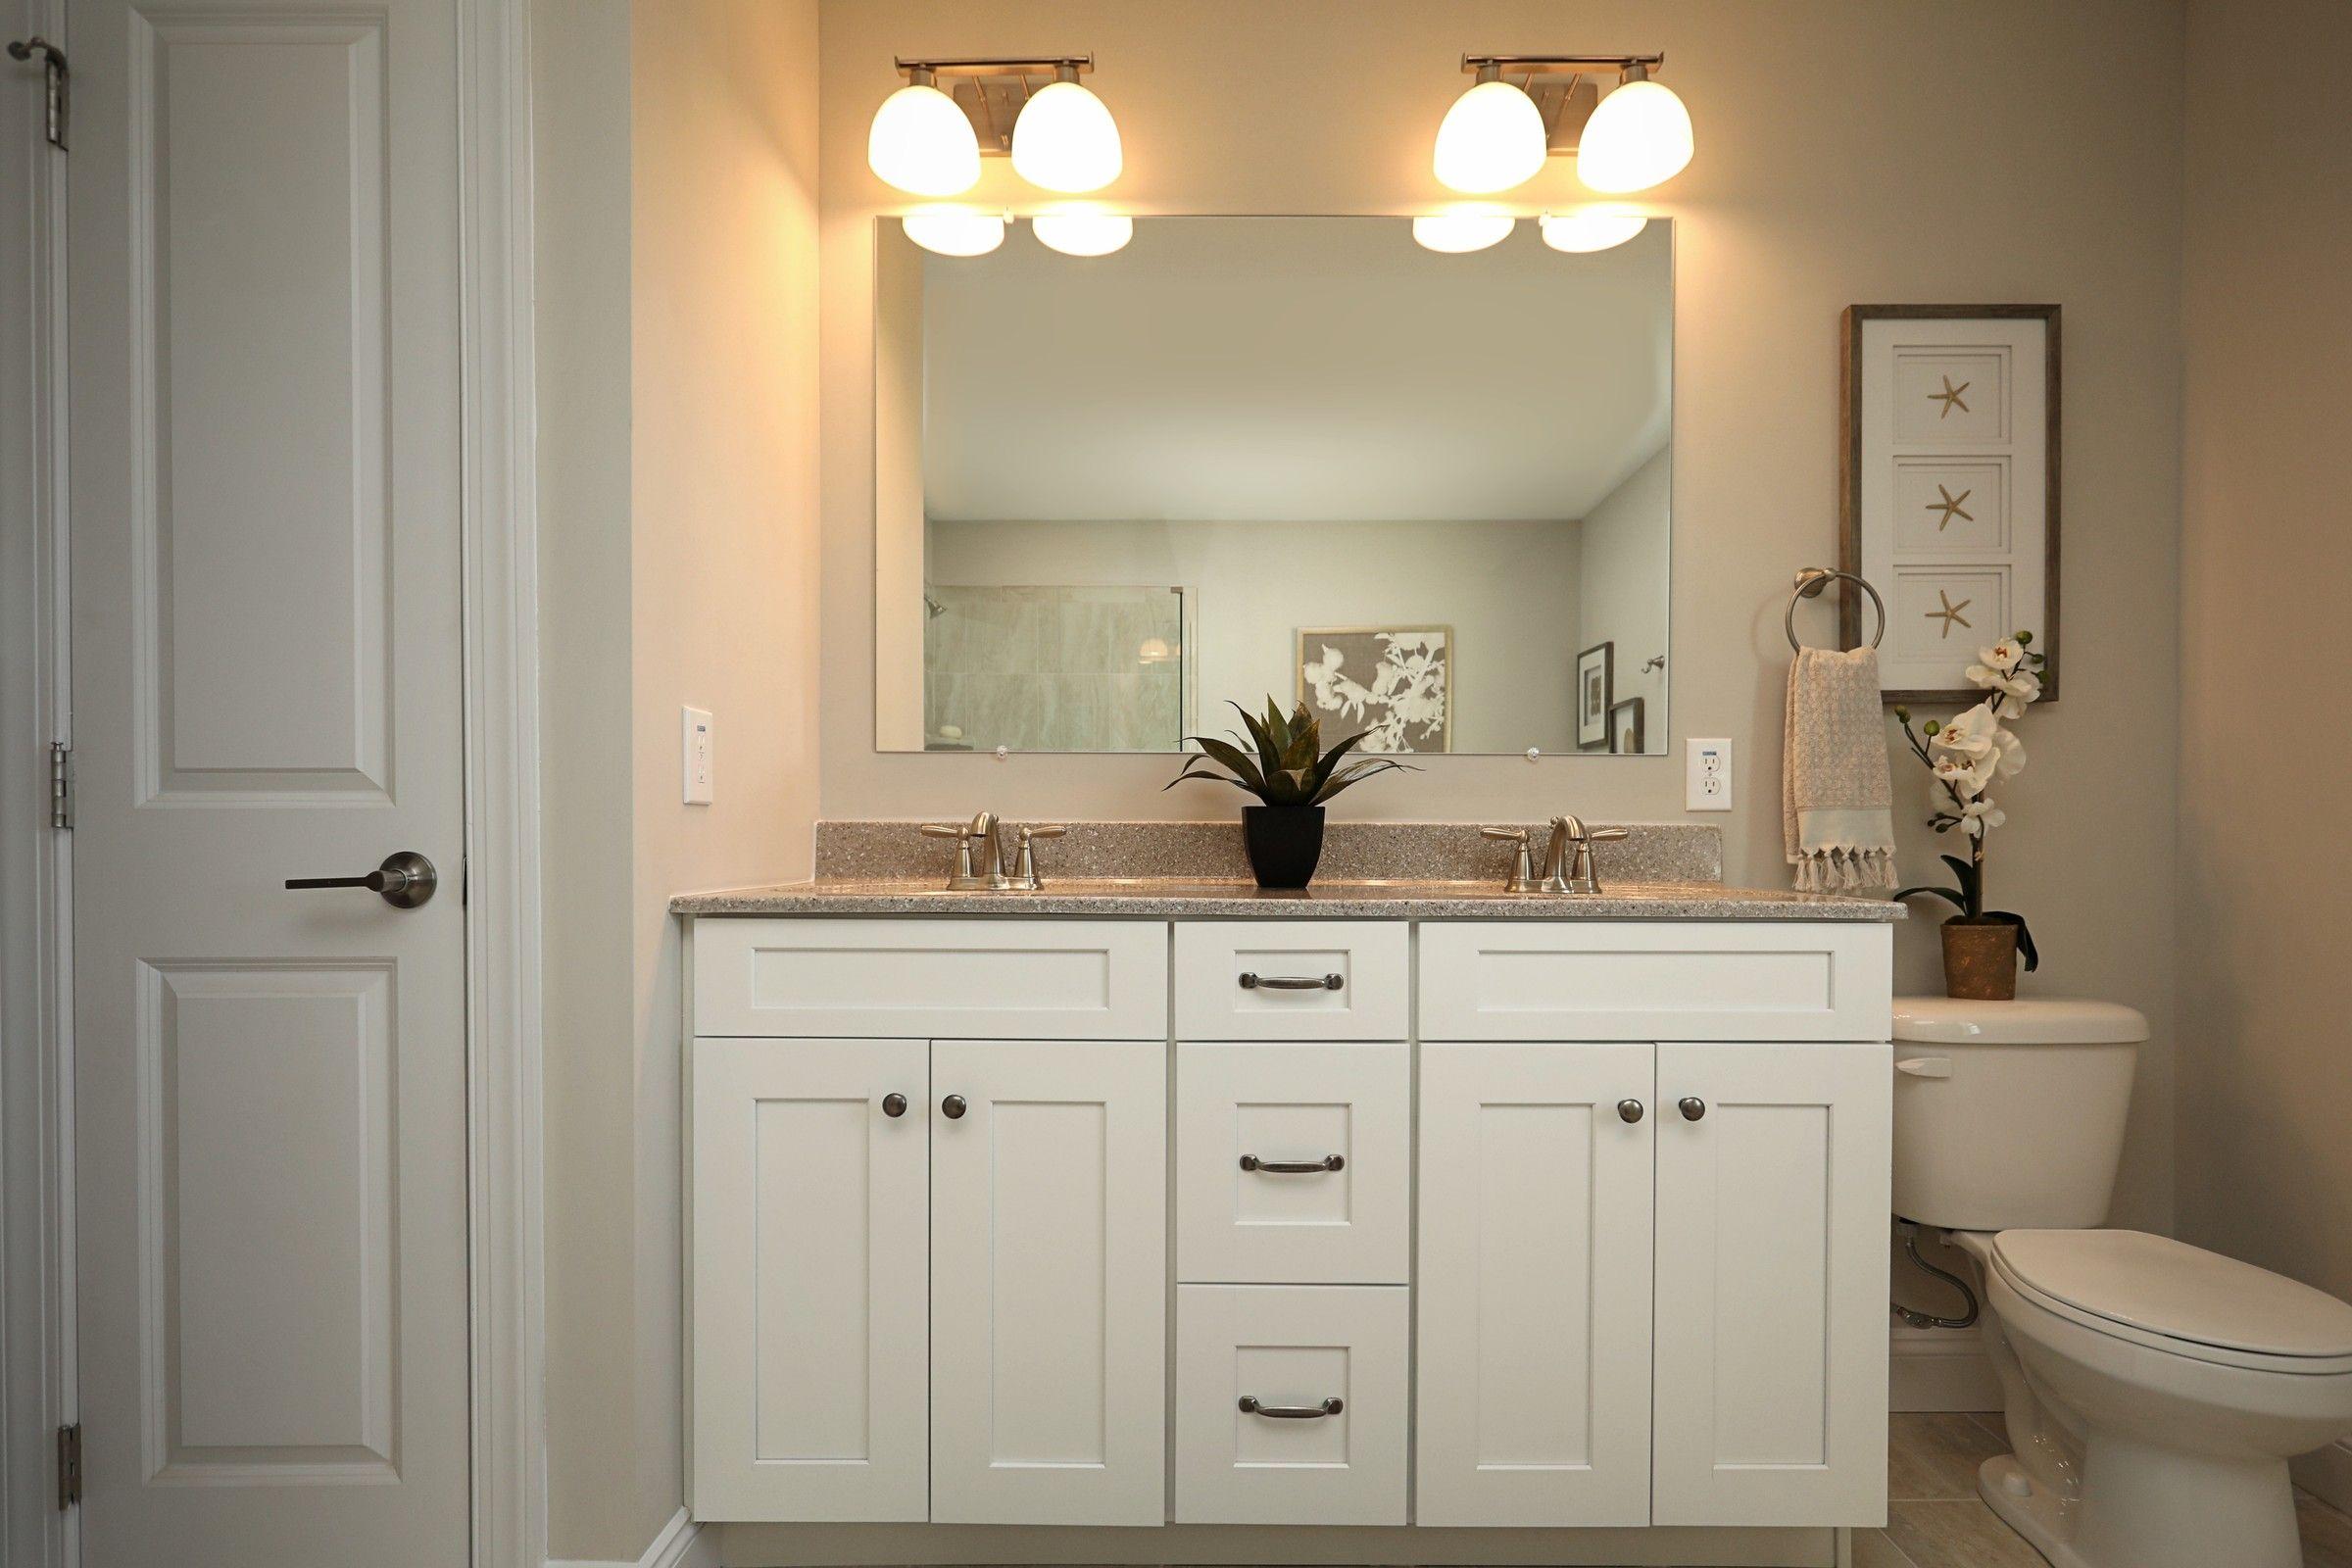 Bathroom featured in the Windsor Normandy By Keystone Custom Homes in Harrisburg, PA